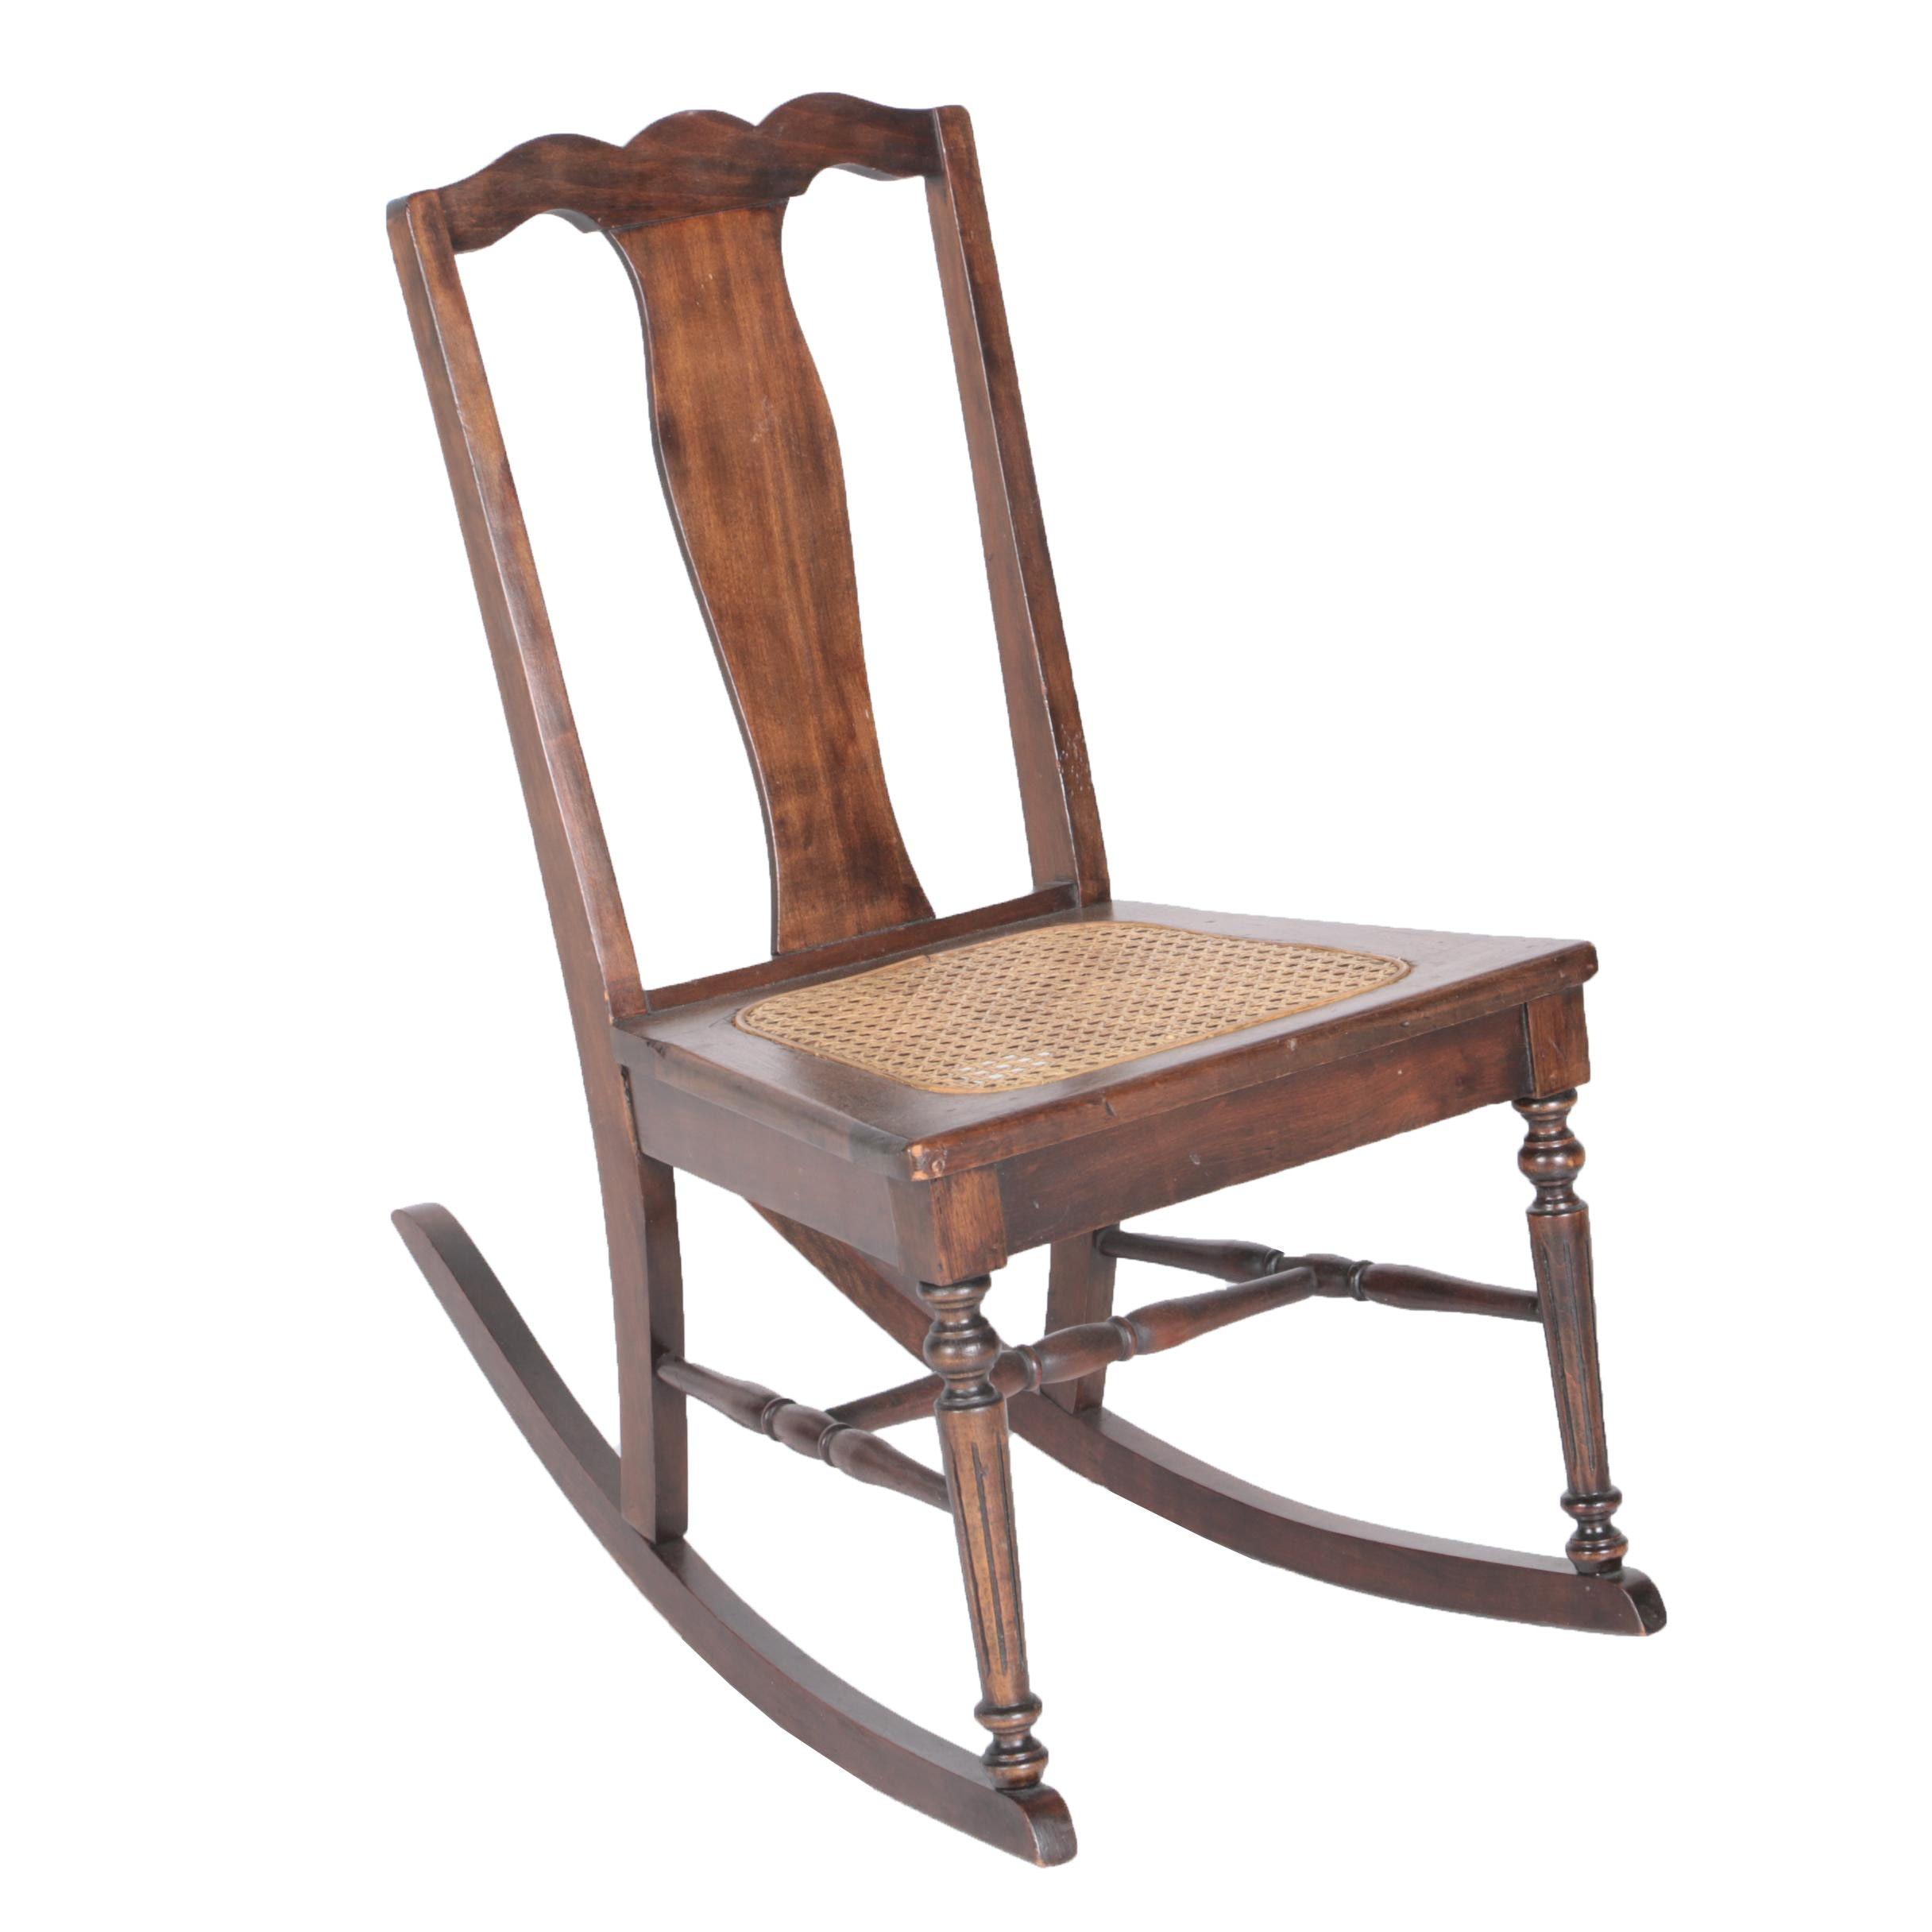 Child Size Vintage Rocking Chair